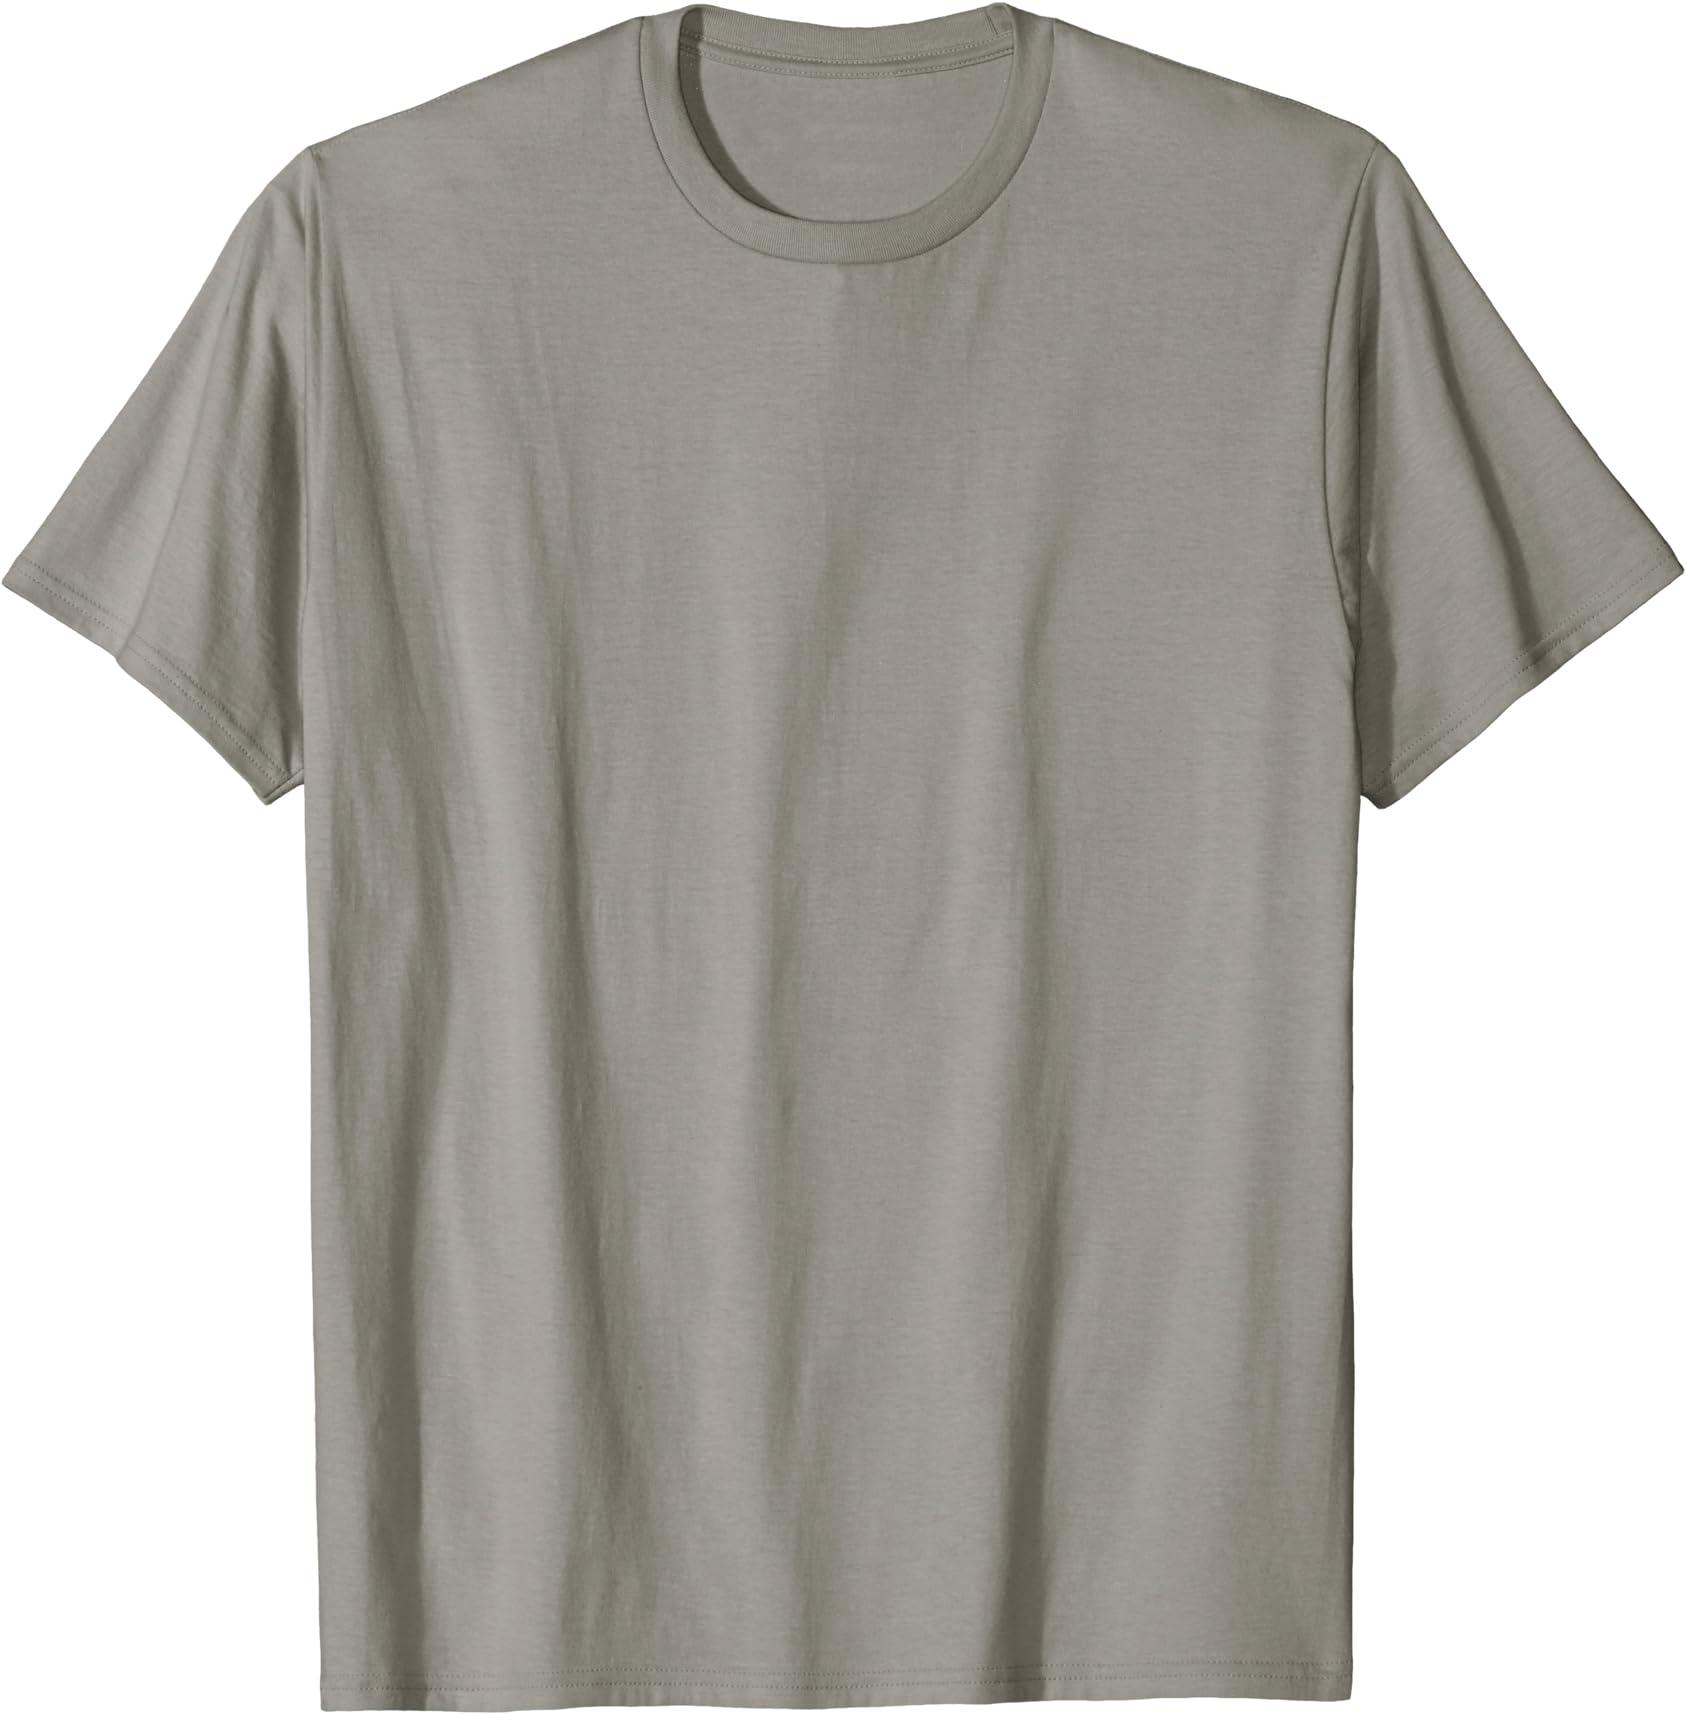 We/'re Hoping It/'s a Unicorn Maternity T-shirt Pregnancy Tee Shirts